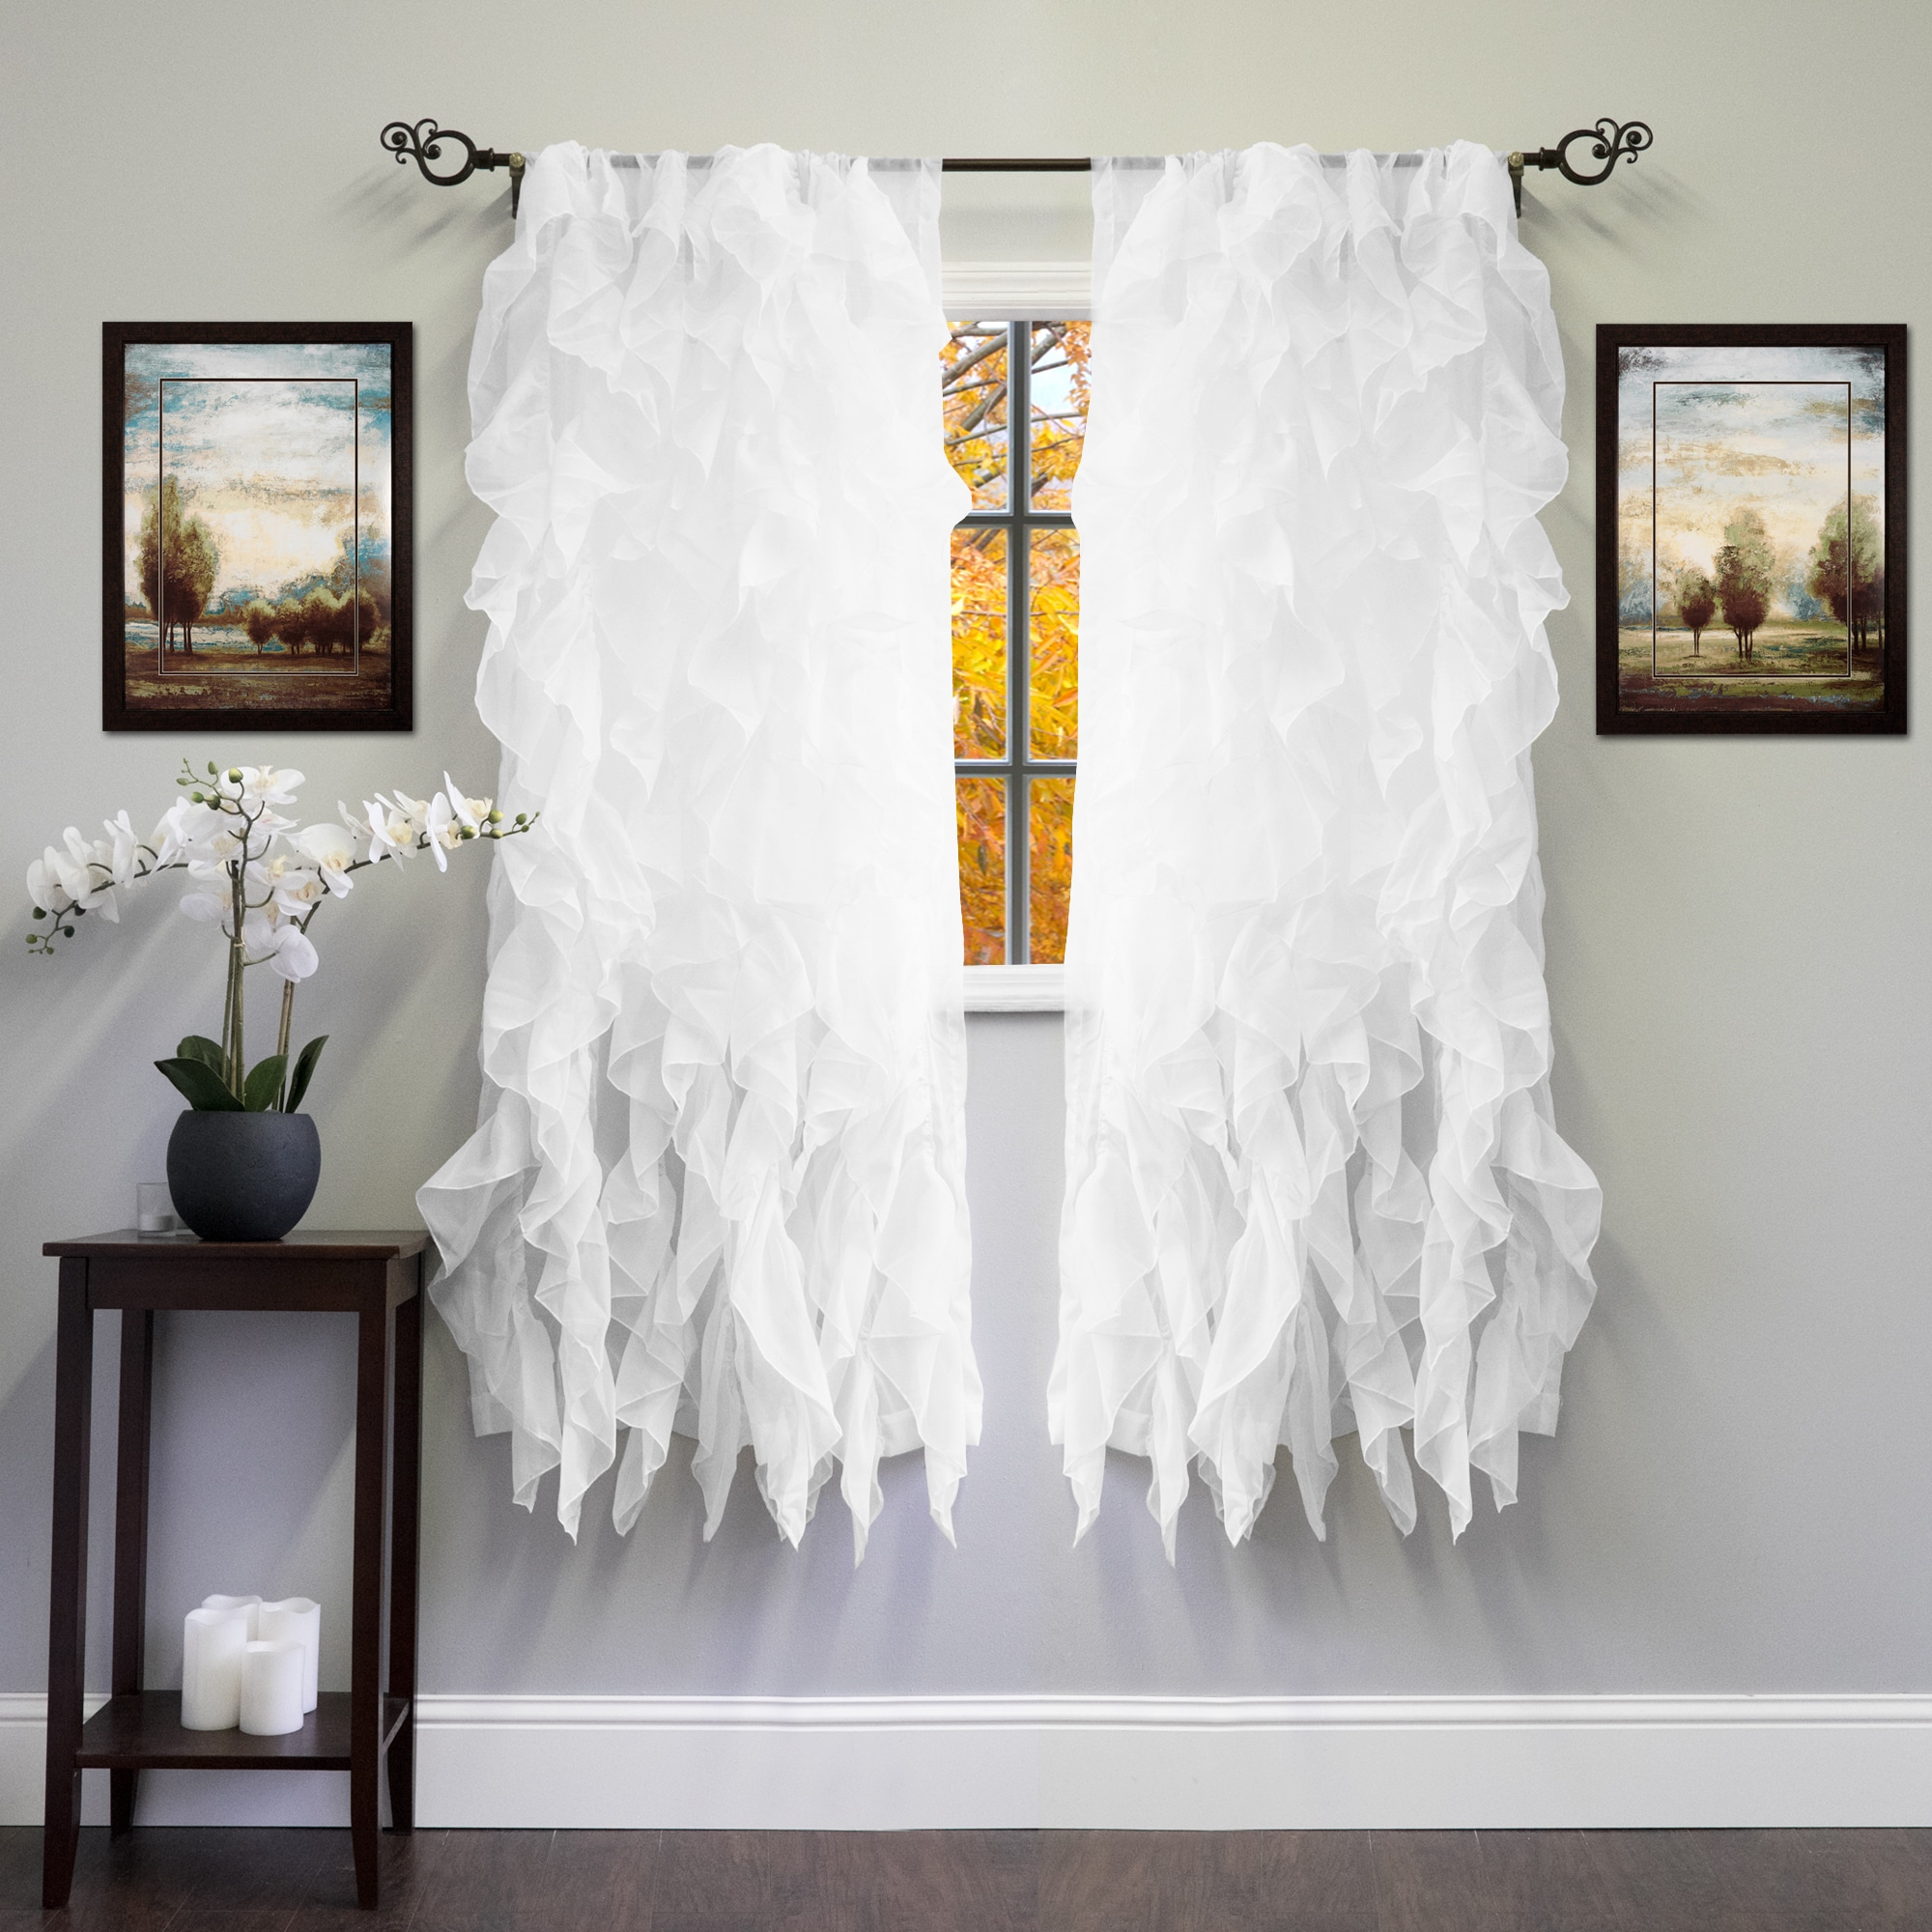 Shop Voile 50 X 63 Vertical Ruffle Tier Window Curtain Panel 50 X